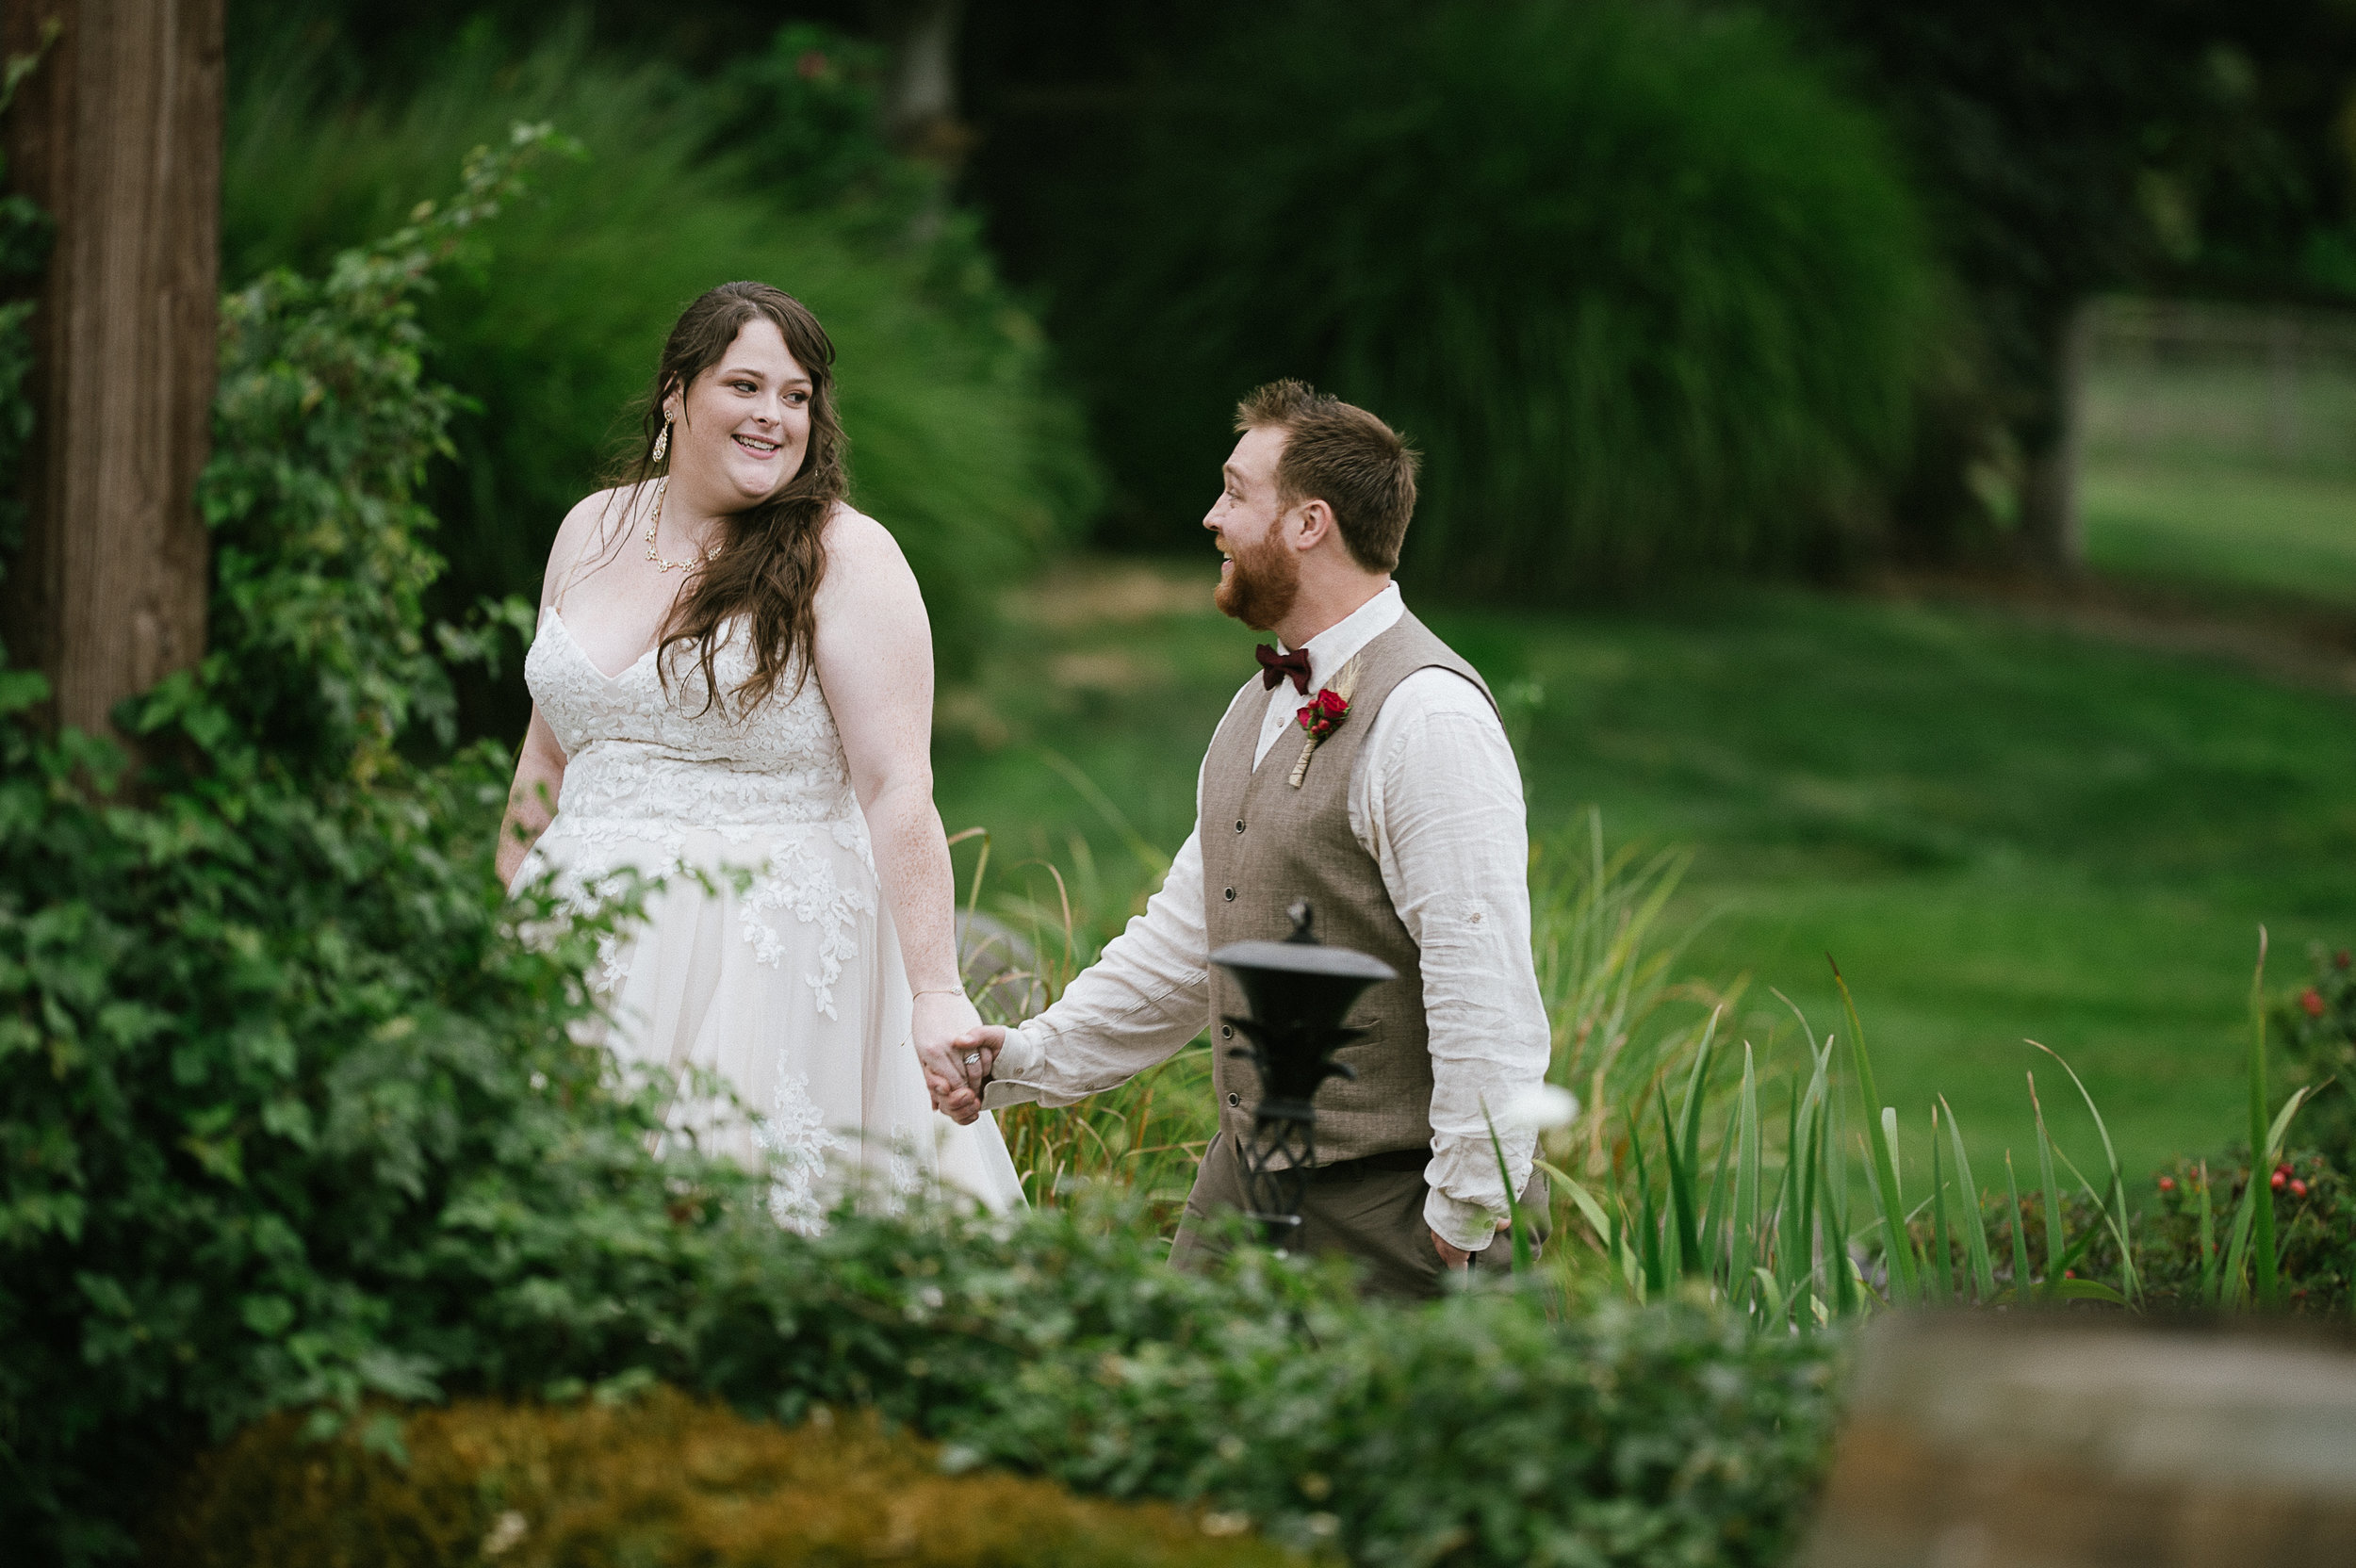 Swan Trail Farm Wedding_Sarah Schurman + Brian Skadan_Snohomish Wedding_Kelsey Lane Photography-6252.jpg